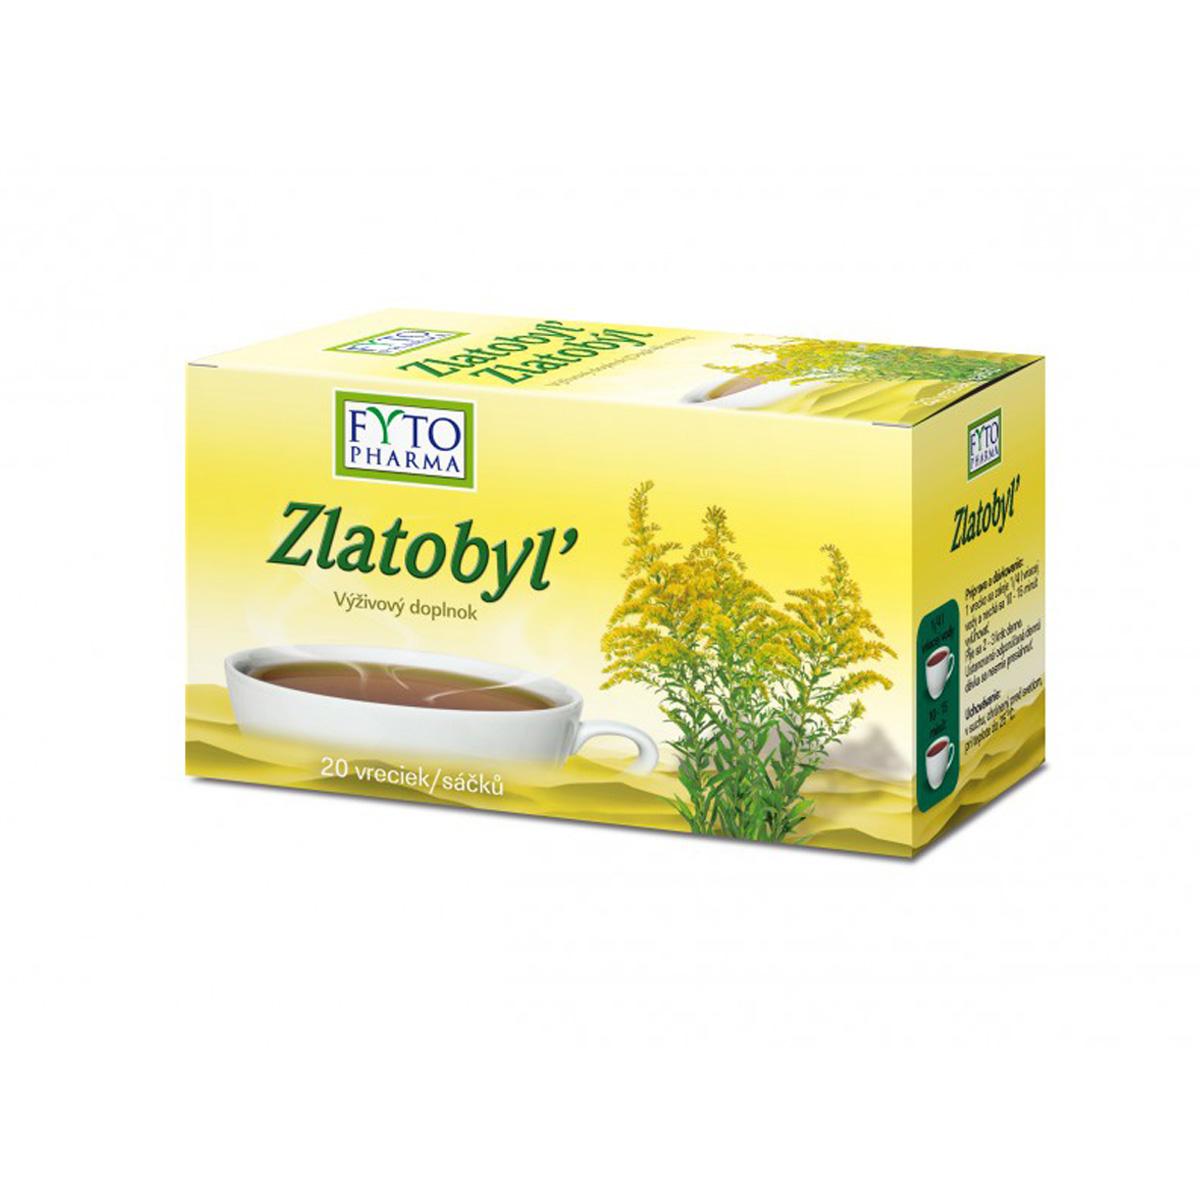 Fytopharma Zlatobýl 20 x 1,5 g